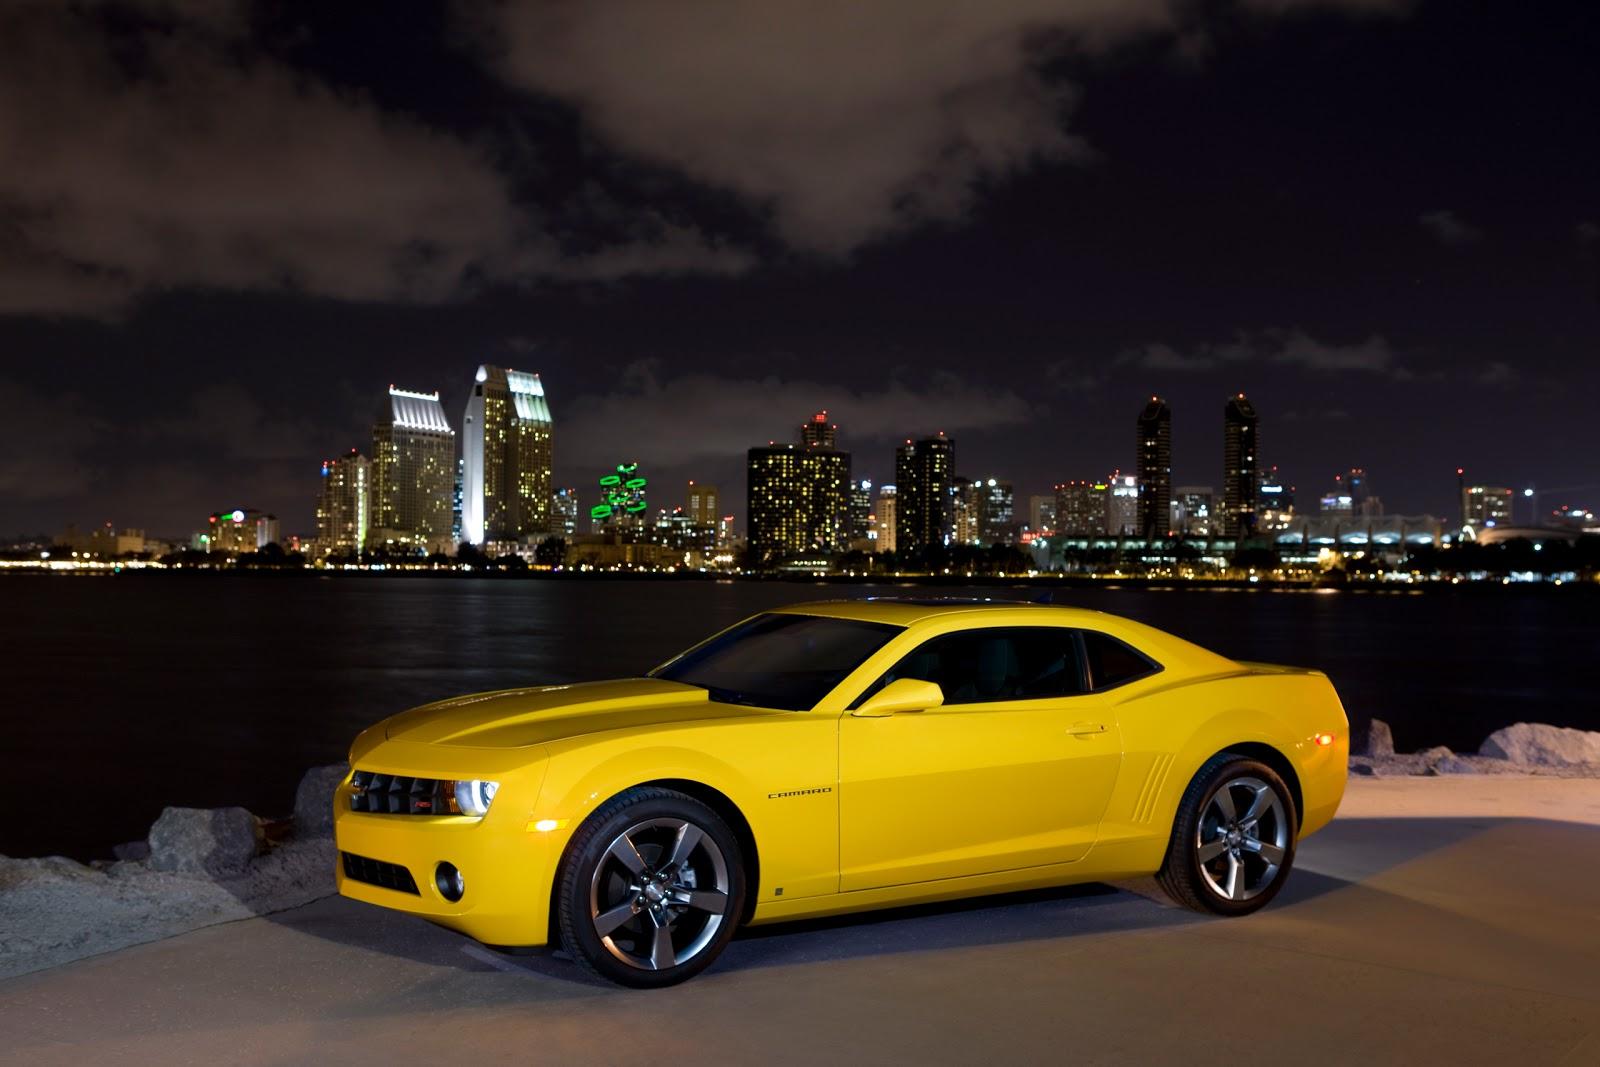 World Of Cars Chevrolet Camaro Yellow